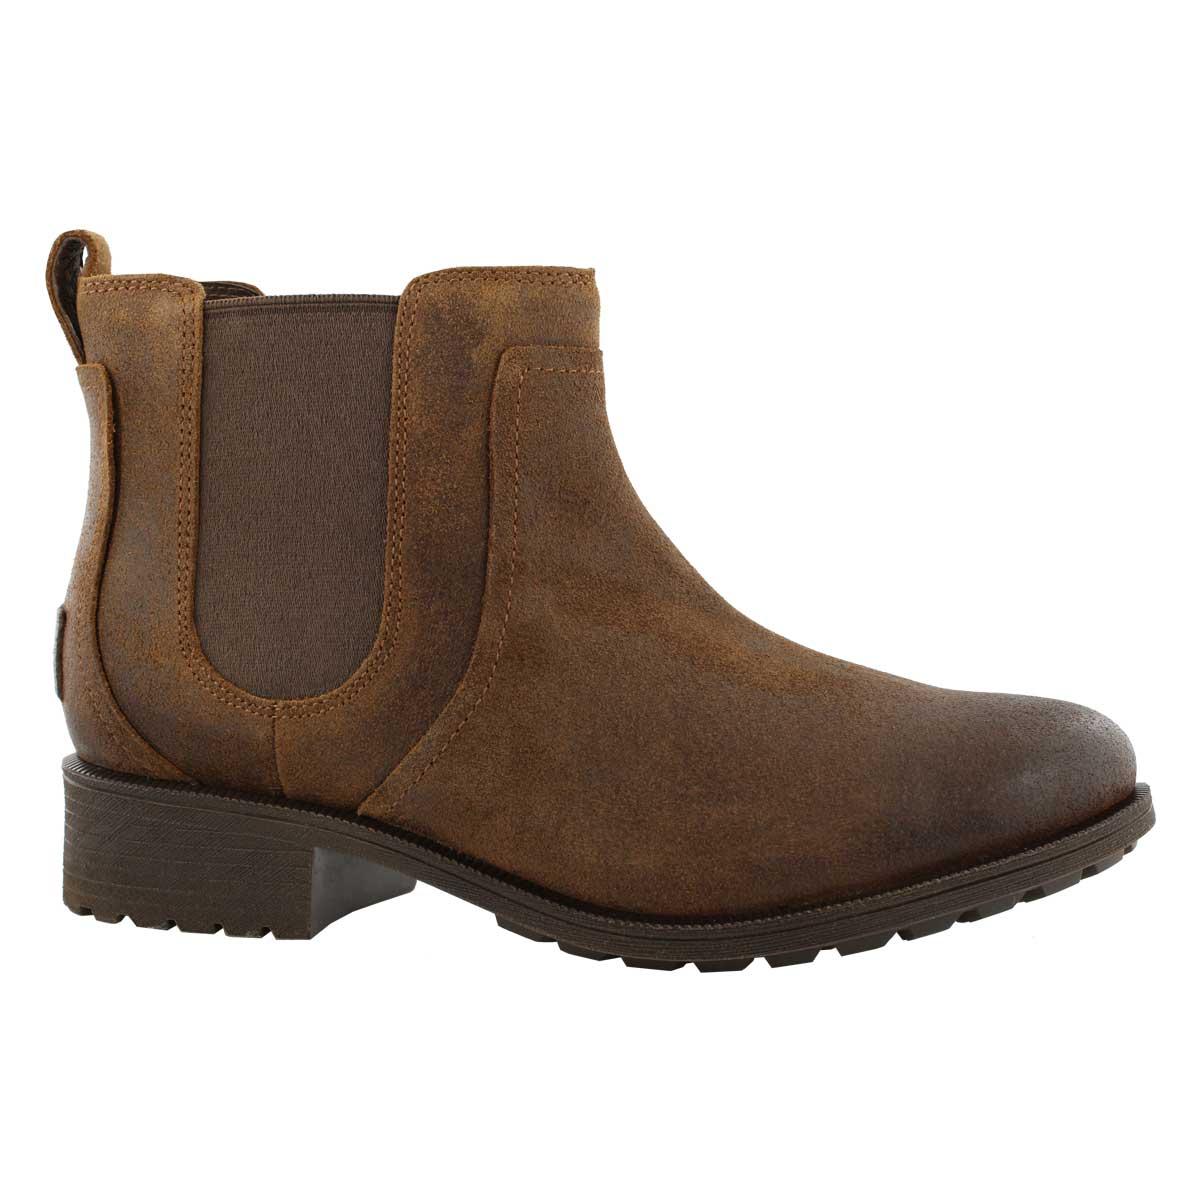 Lds Bonham II chipmunk wtpf chelsea boot